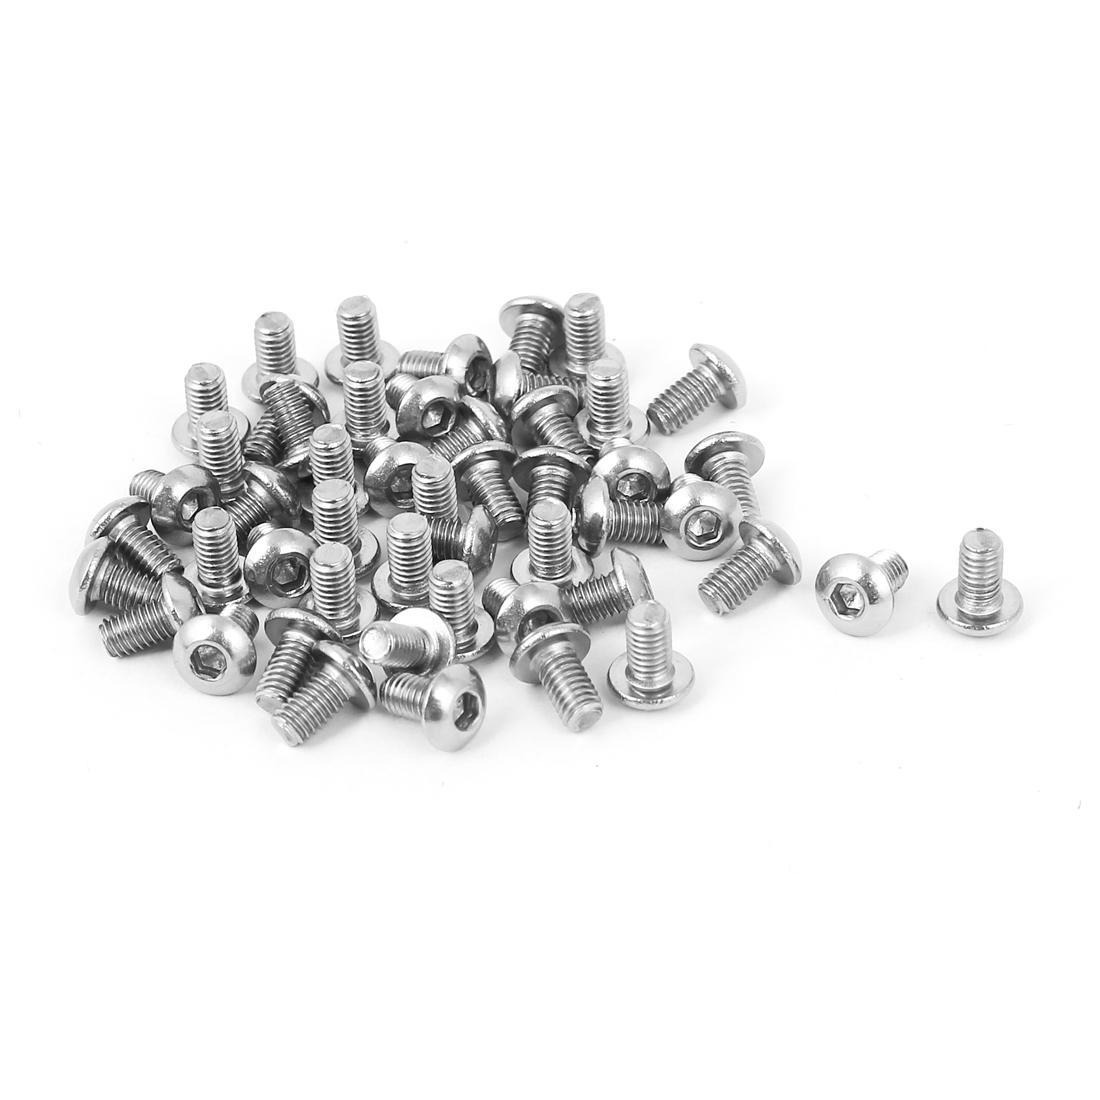 50 Pcs M3 x 5mm Full Thread Stainless Steel Button Head Socket Cap Screw